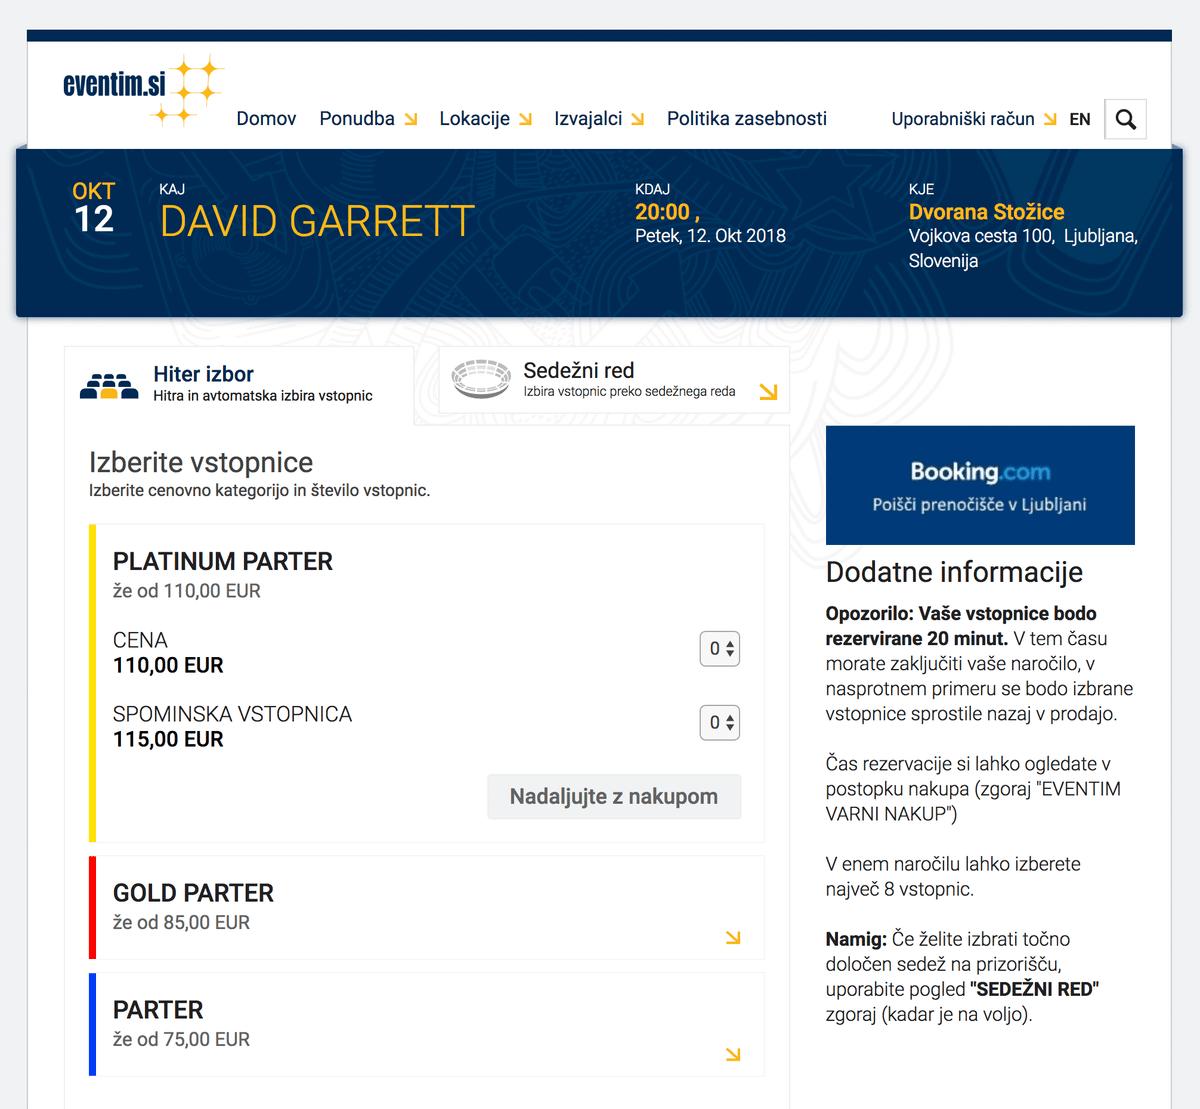 Билеты на концерт скрипача-виртуоза Дэвида Гарретта